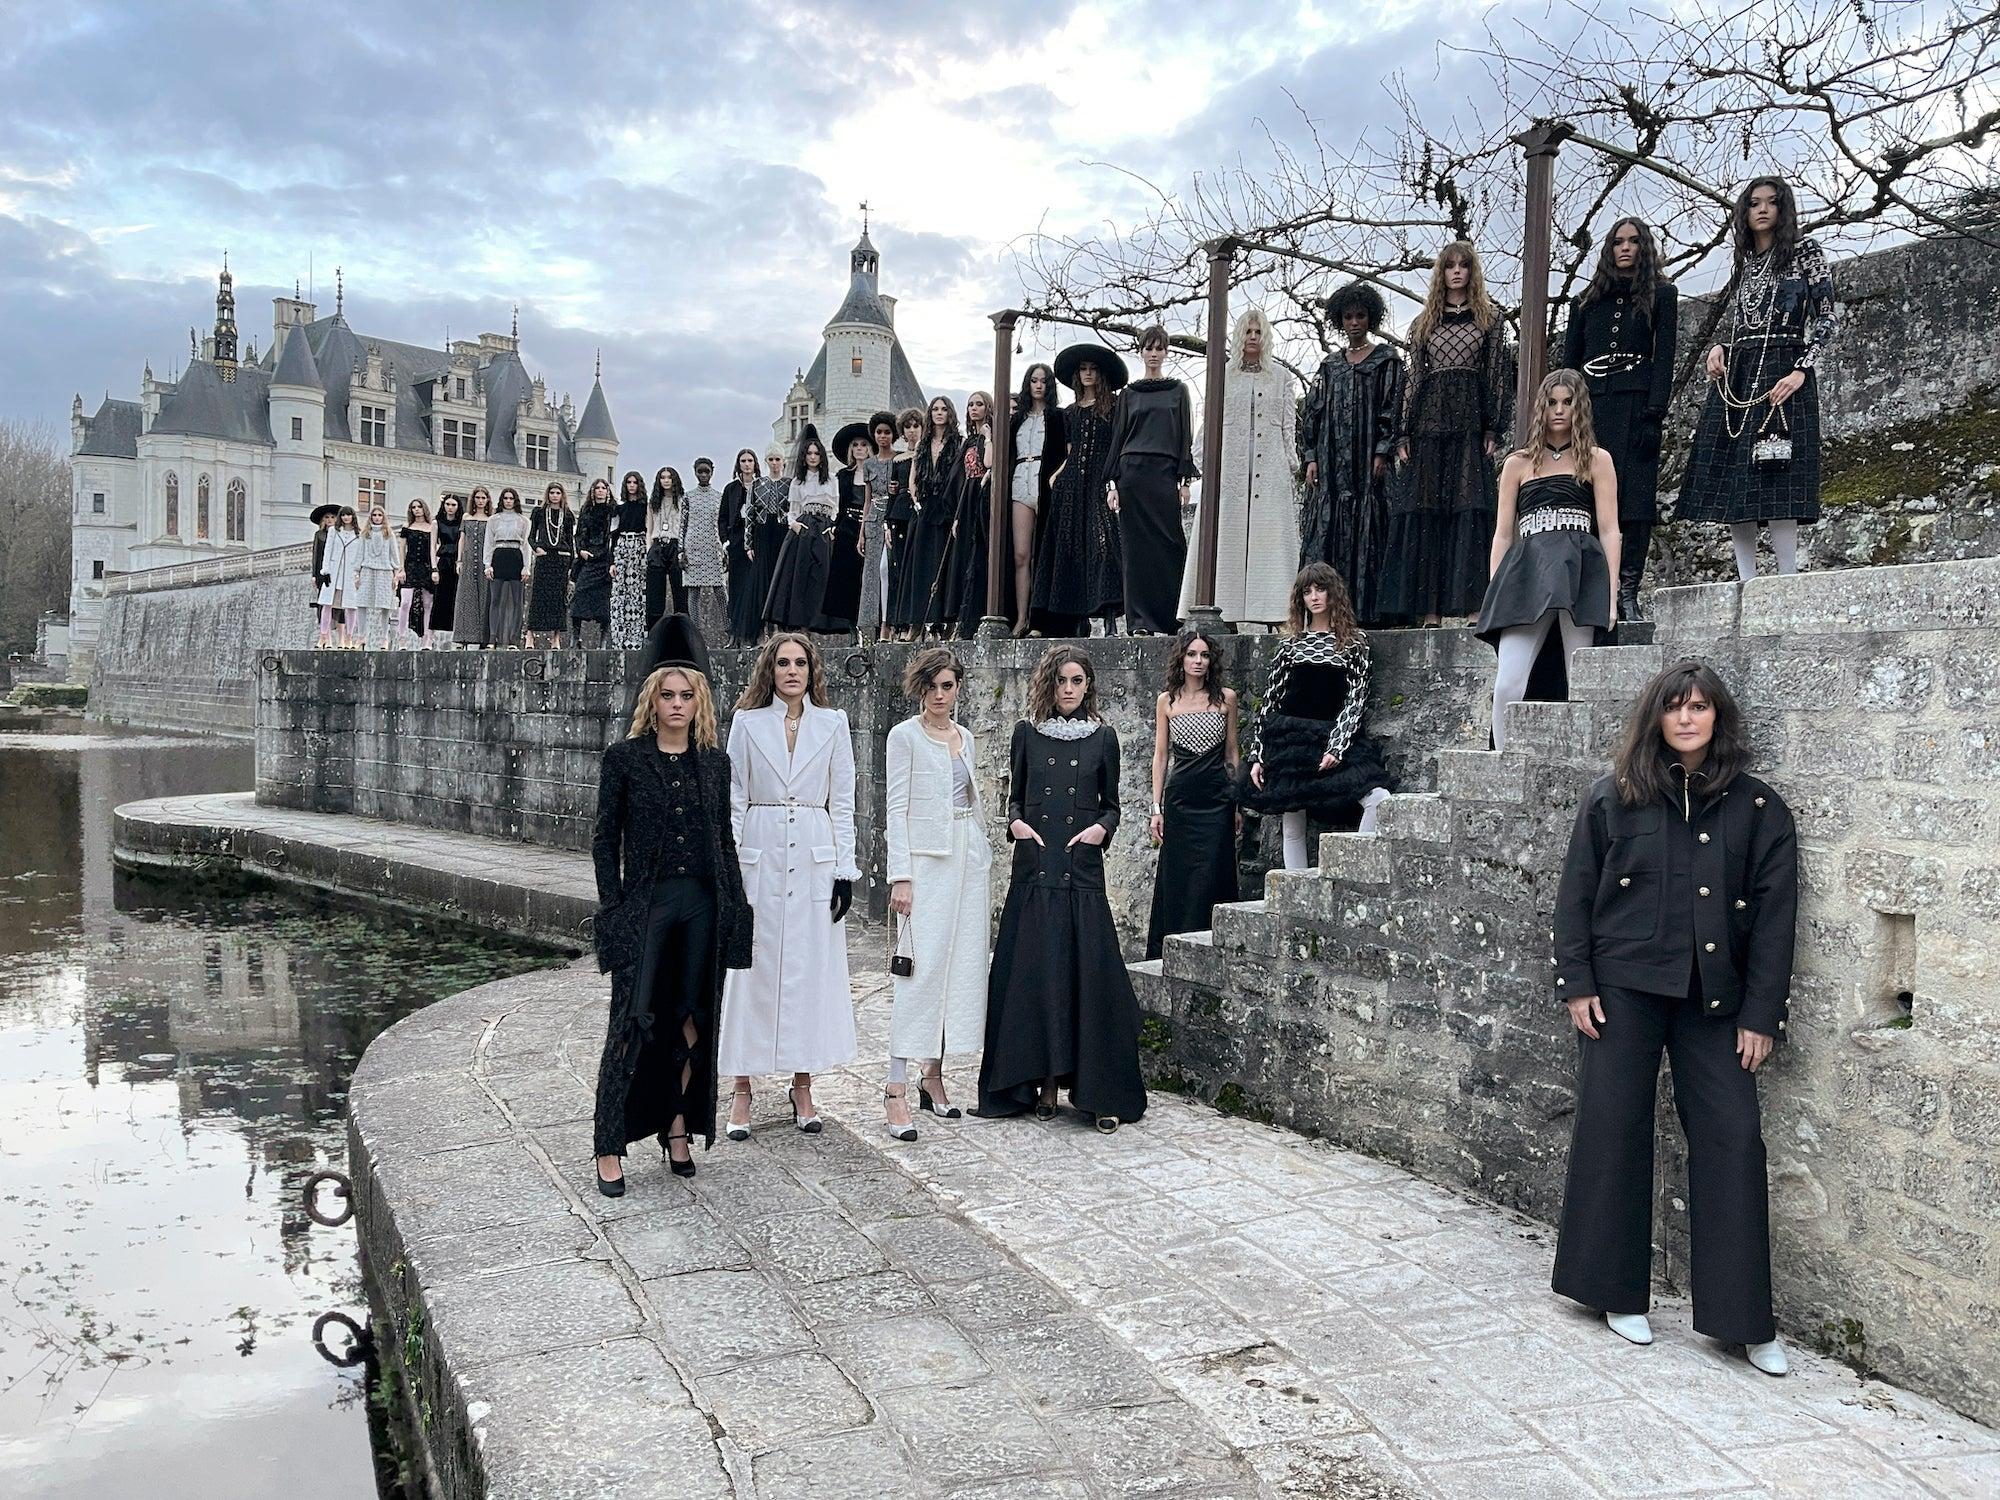 Virginie Viard s modelka v kolekci Chanel Metiers d'Art 2020/2021         Autor: Juergen Teller